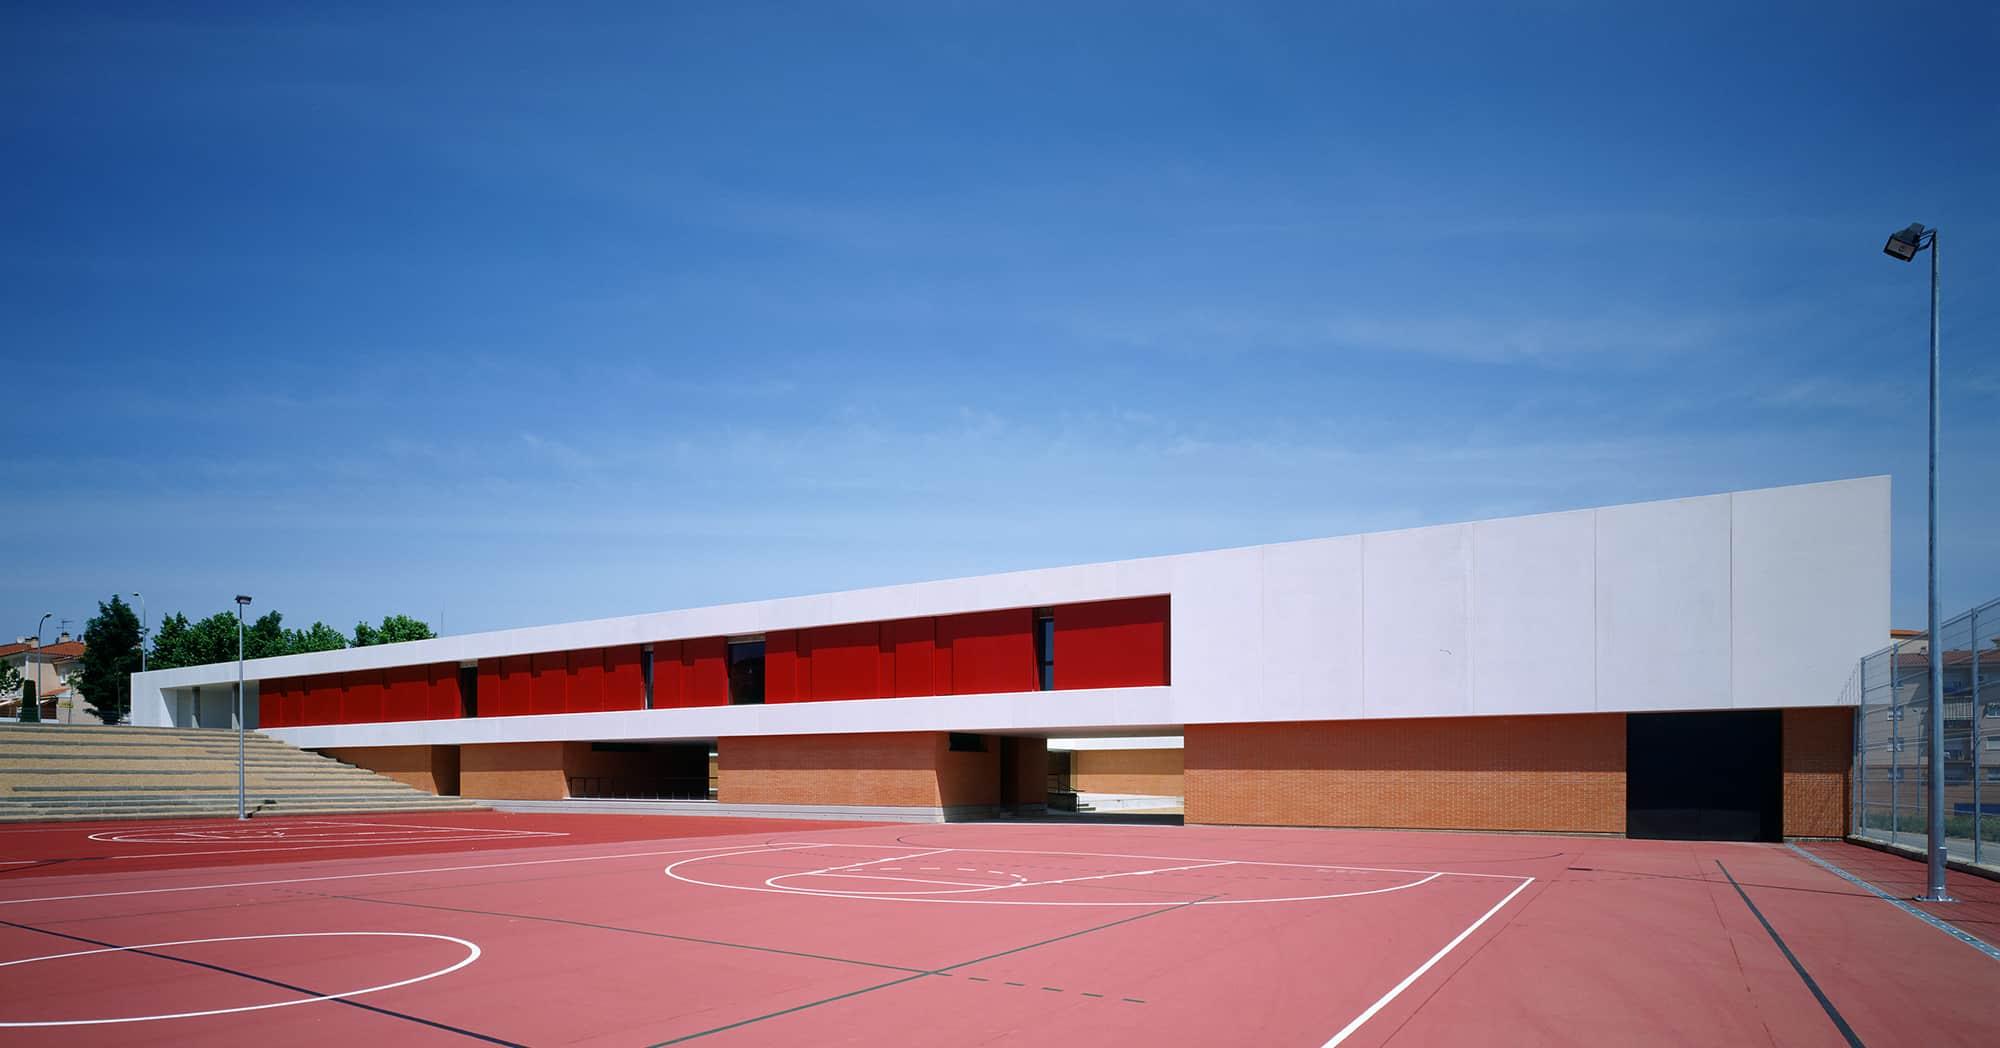 Jusp 006 pista web land nez rey equipo l2g arquitectos for Ies ciudad jardin badajoz